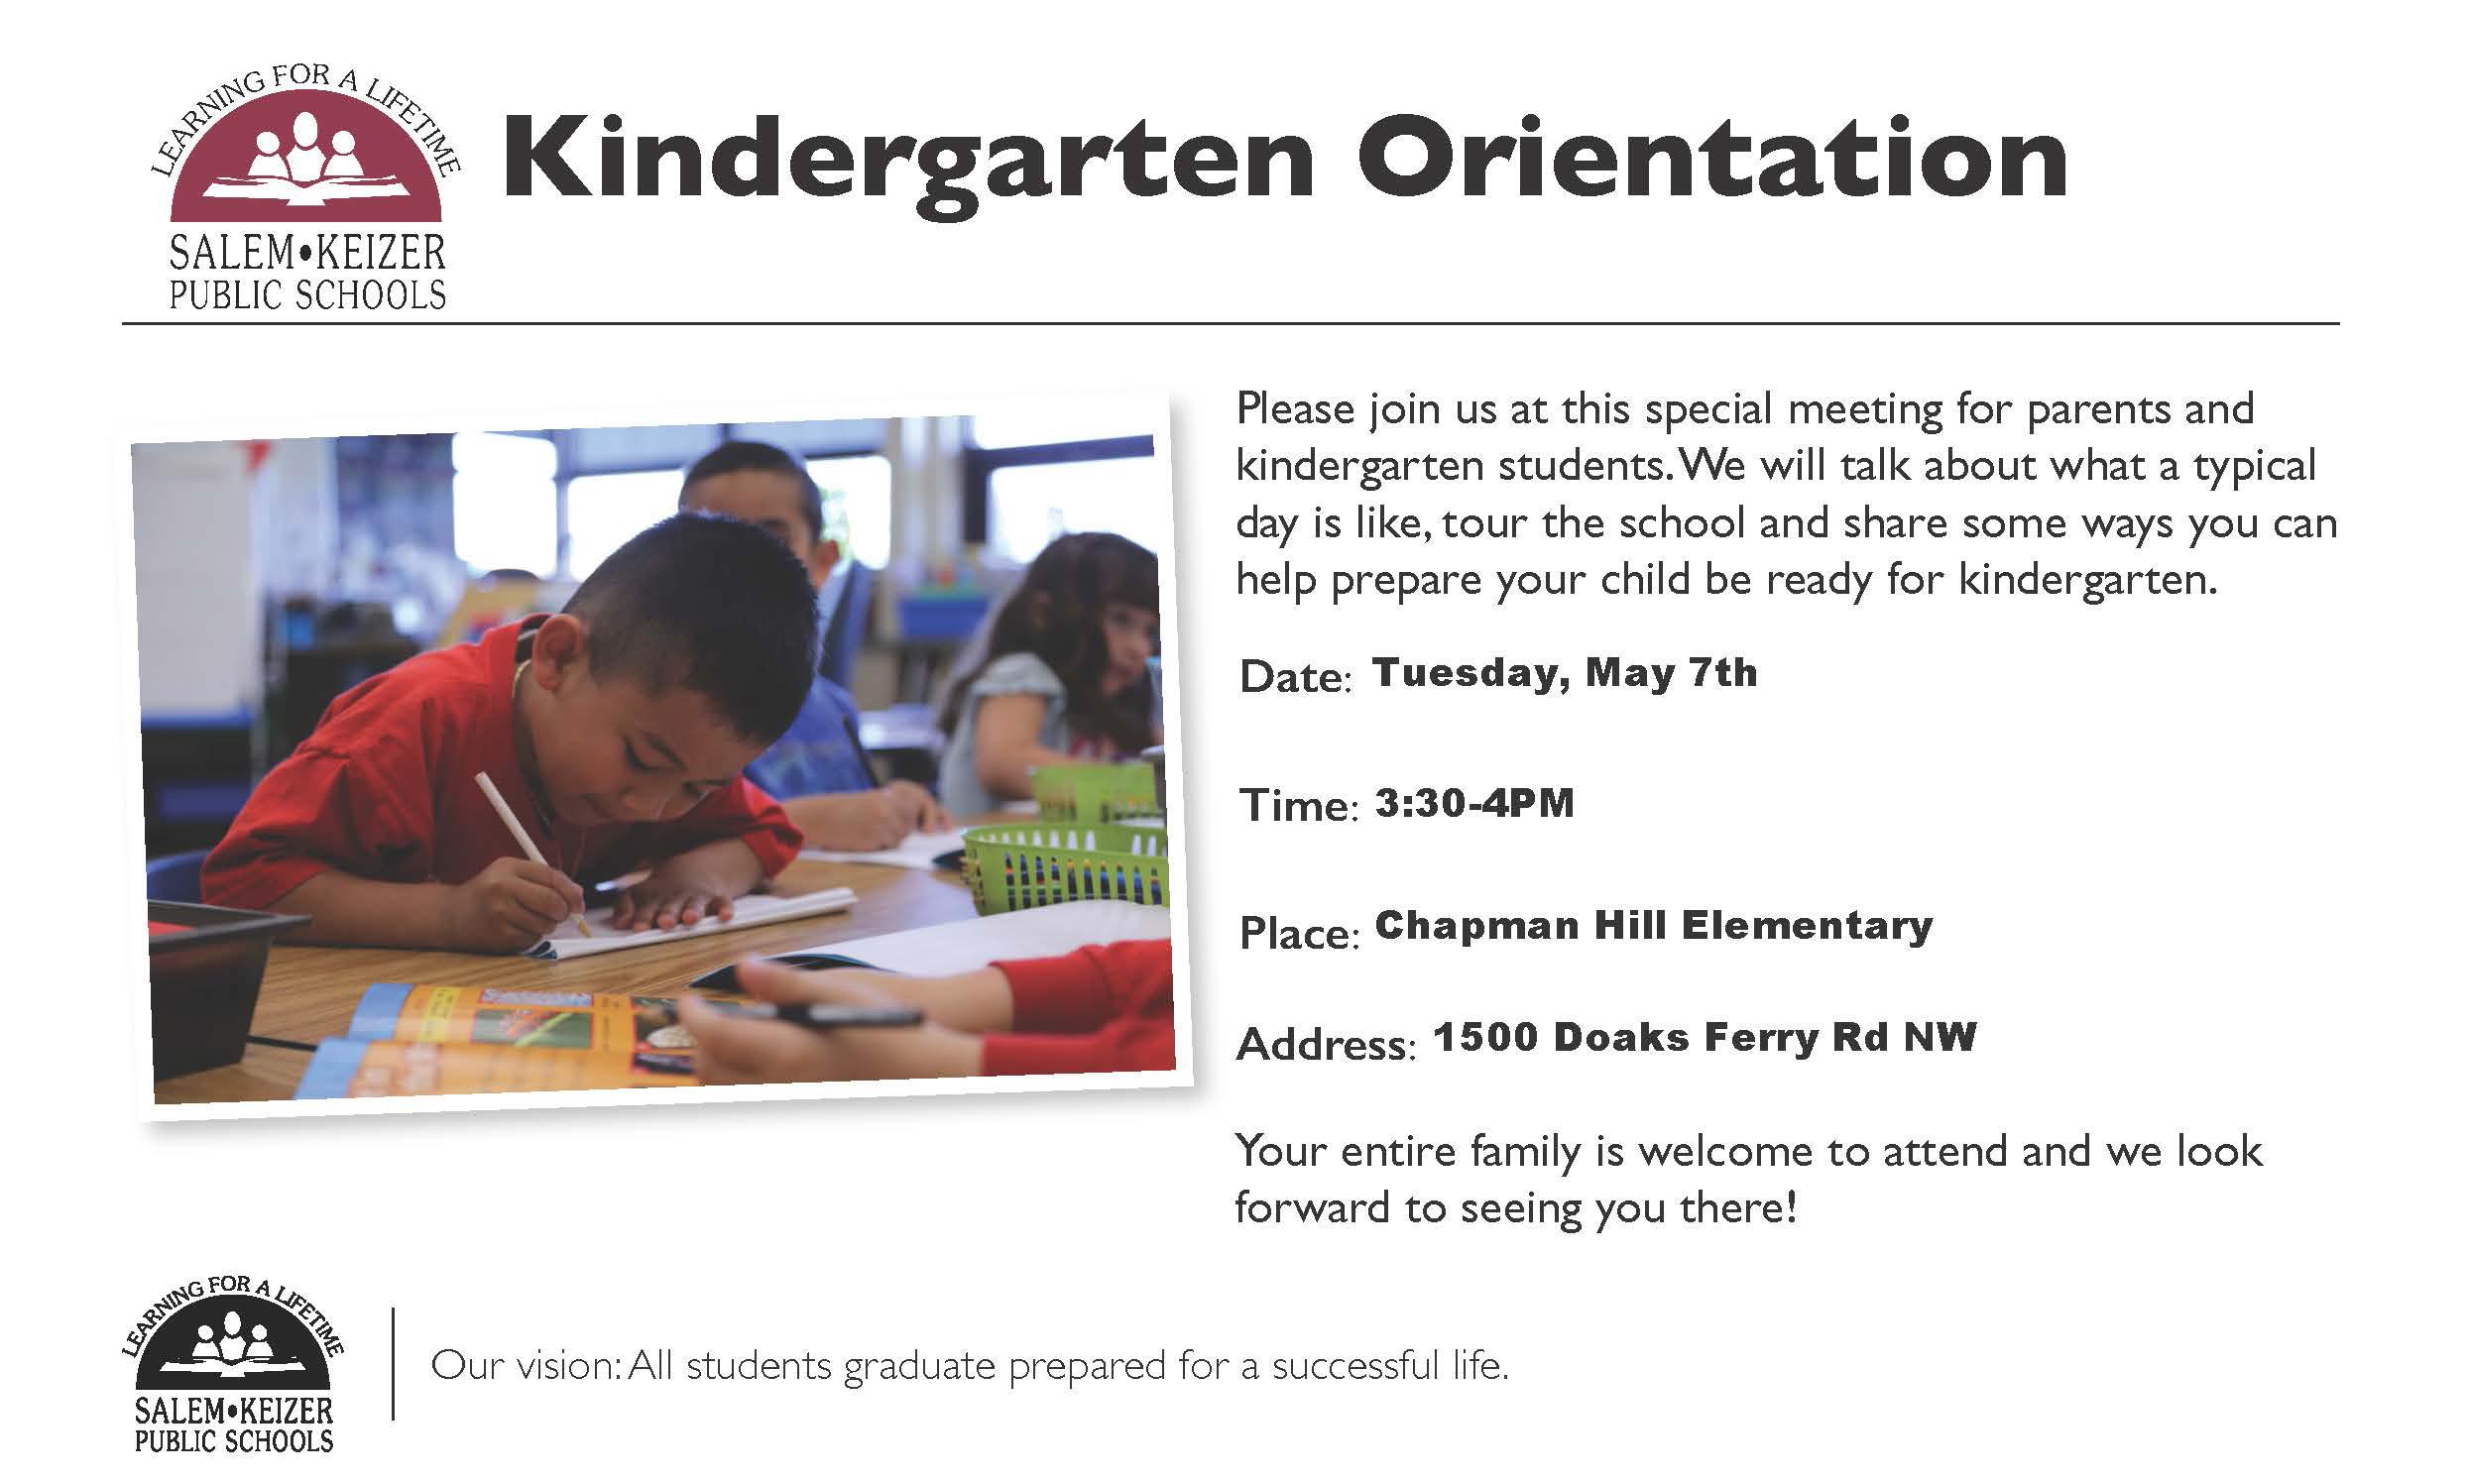 Kindergarten Orientation Invitation